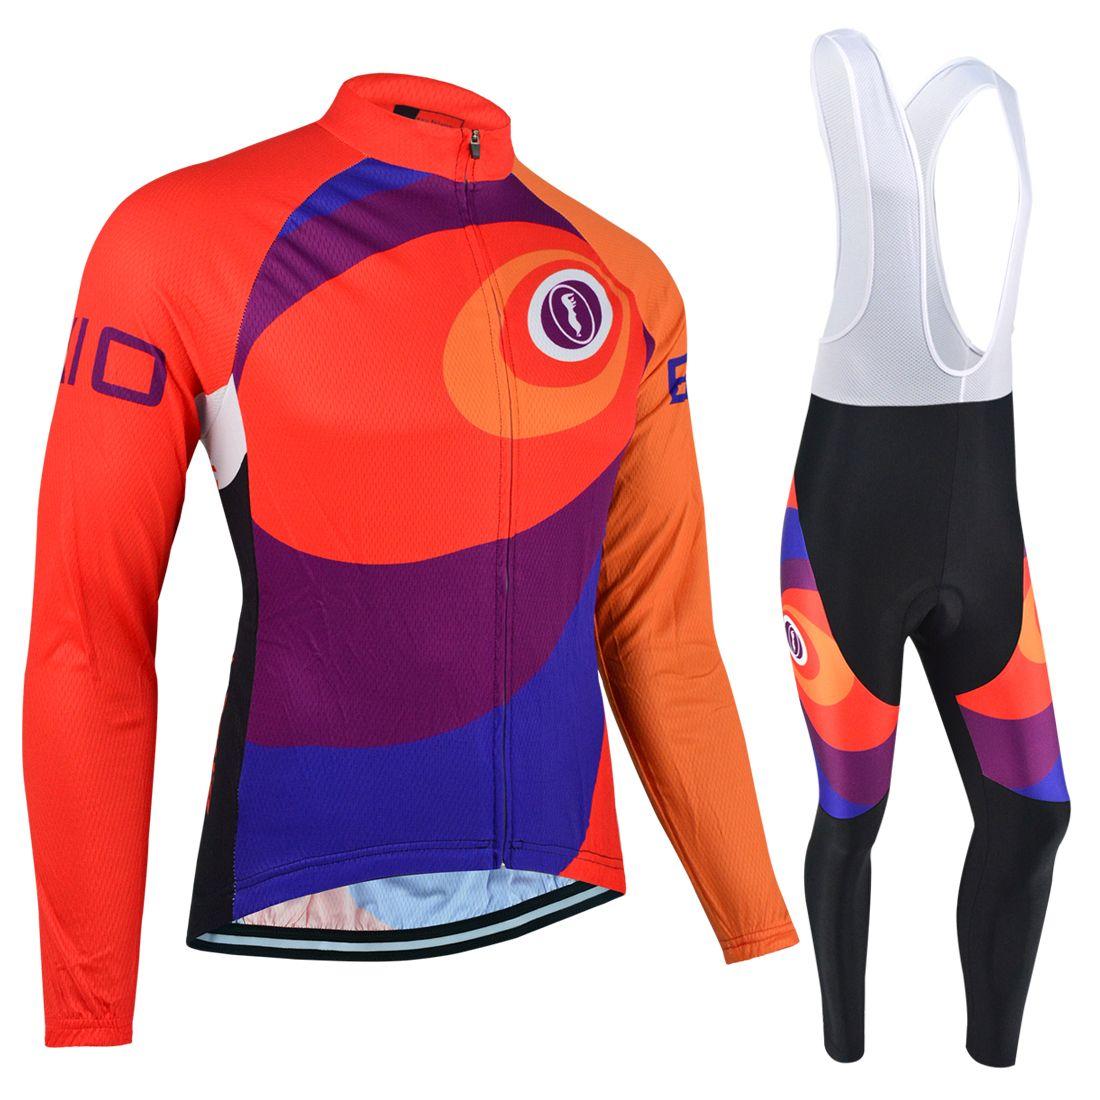 593aa9c84 BXIO Brand Women Cycling Jerseys Set Iridescence Long Sleeve Bicycle ...